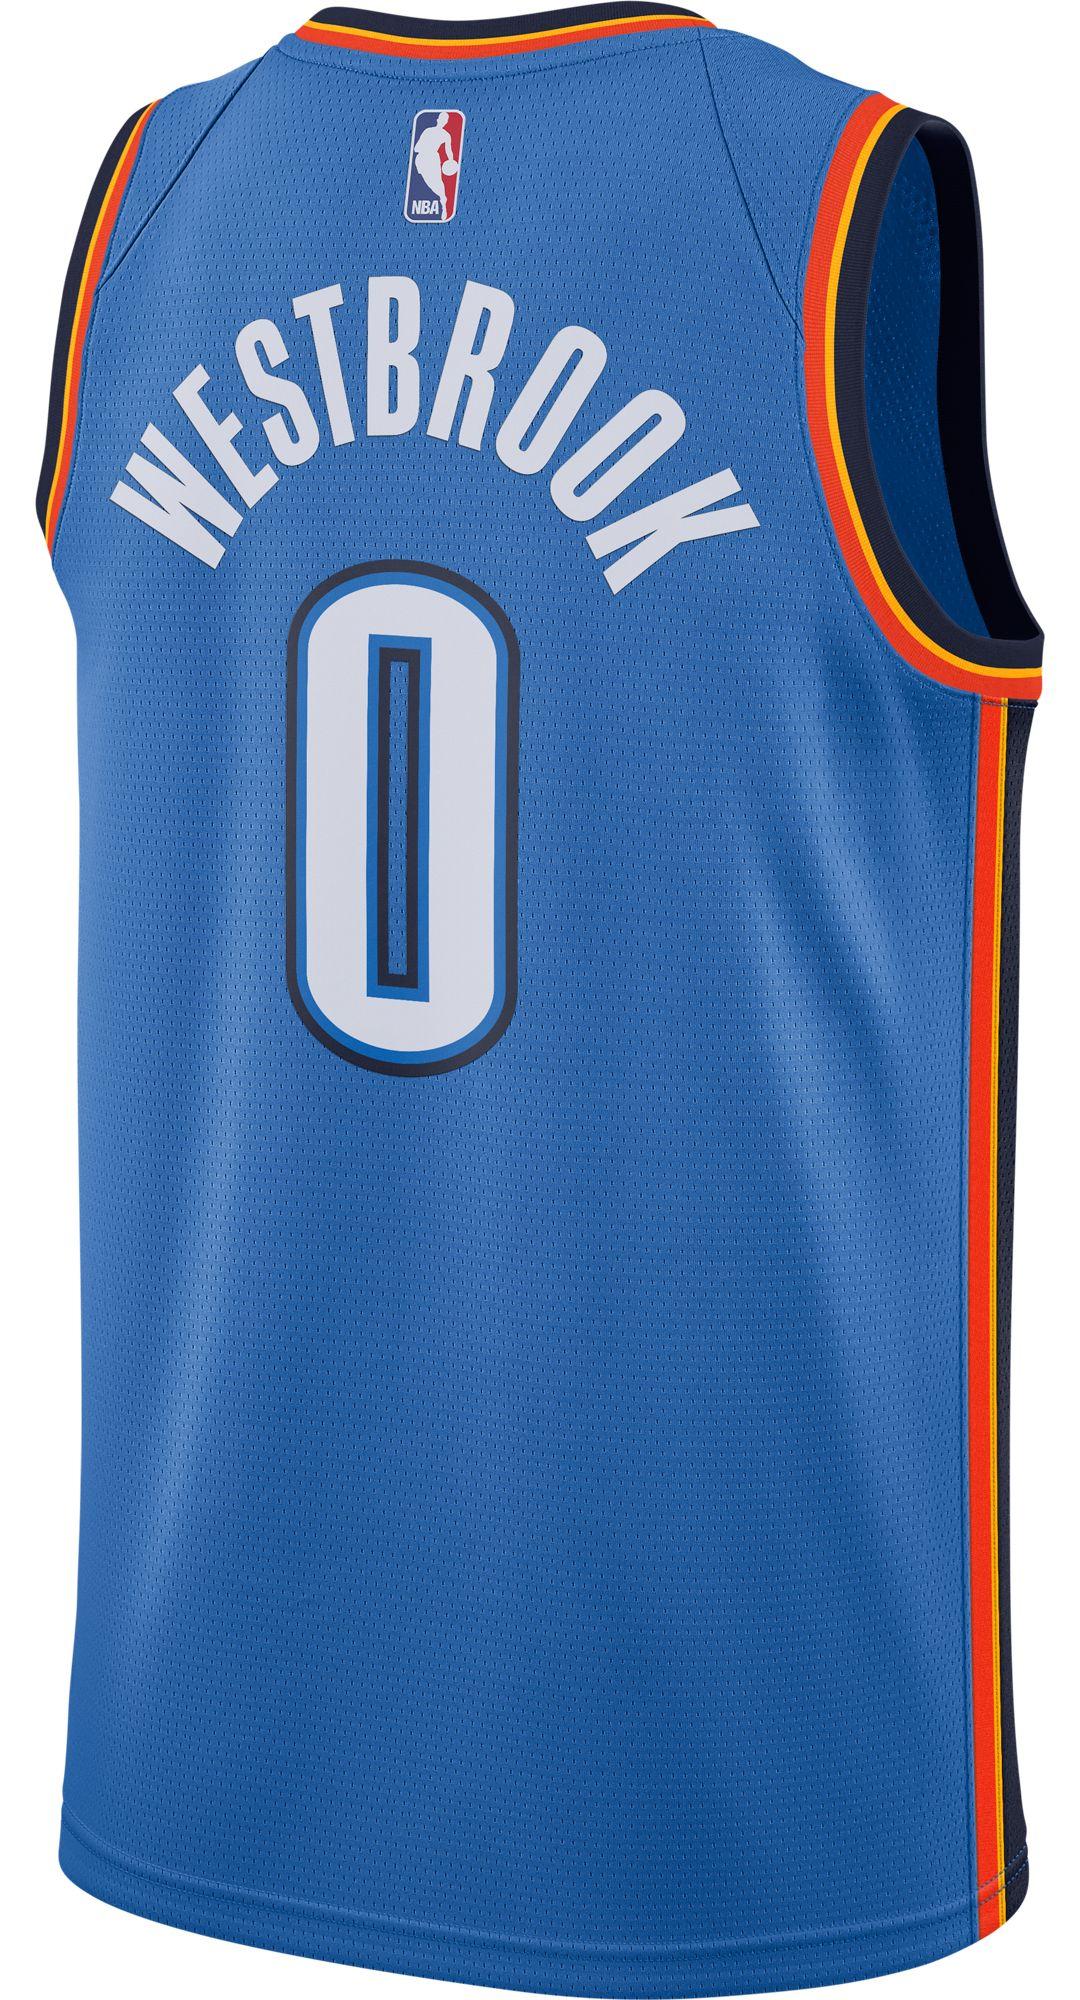 new product 1cafa 79647 Nike Men's Oklahoma City Thunder Russell Westbrook #0 Blue Dri-FIT Swingman  Jersey